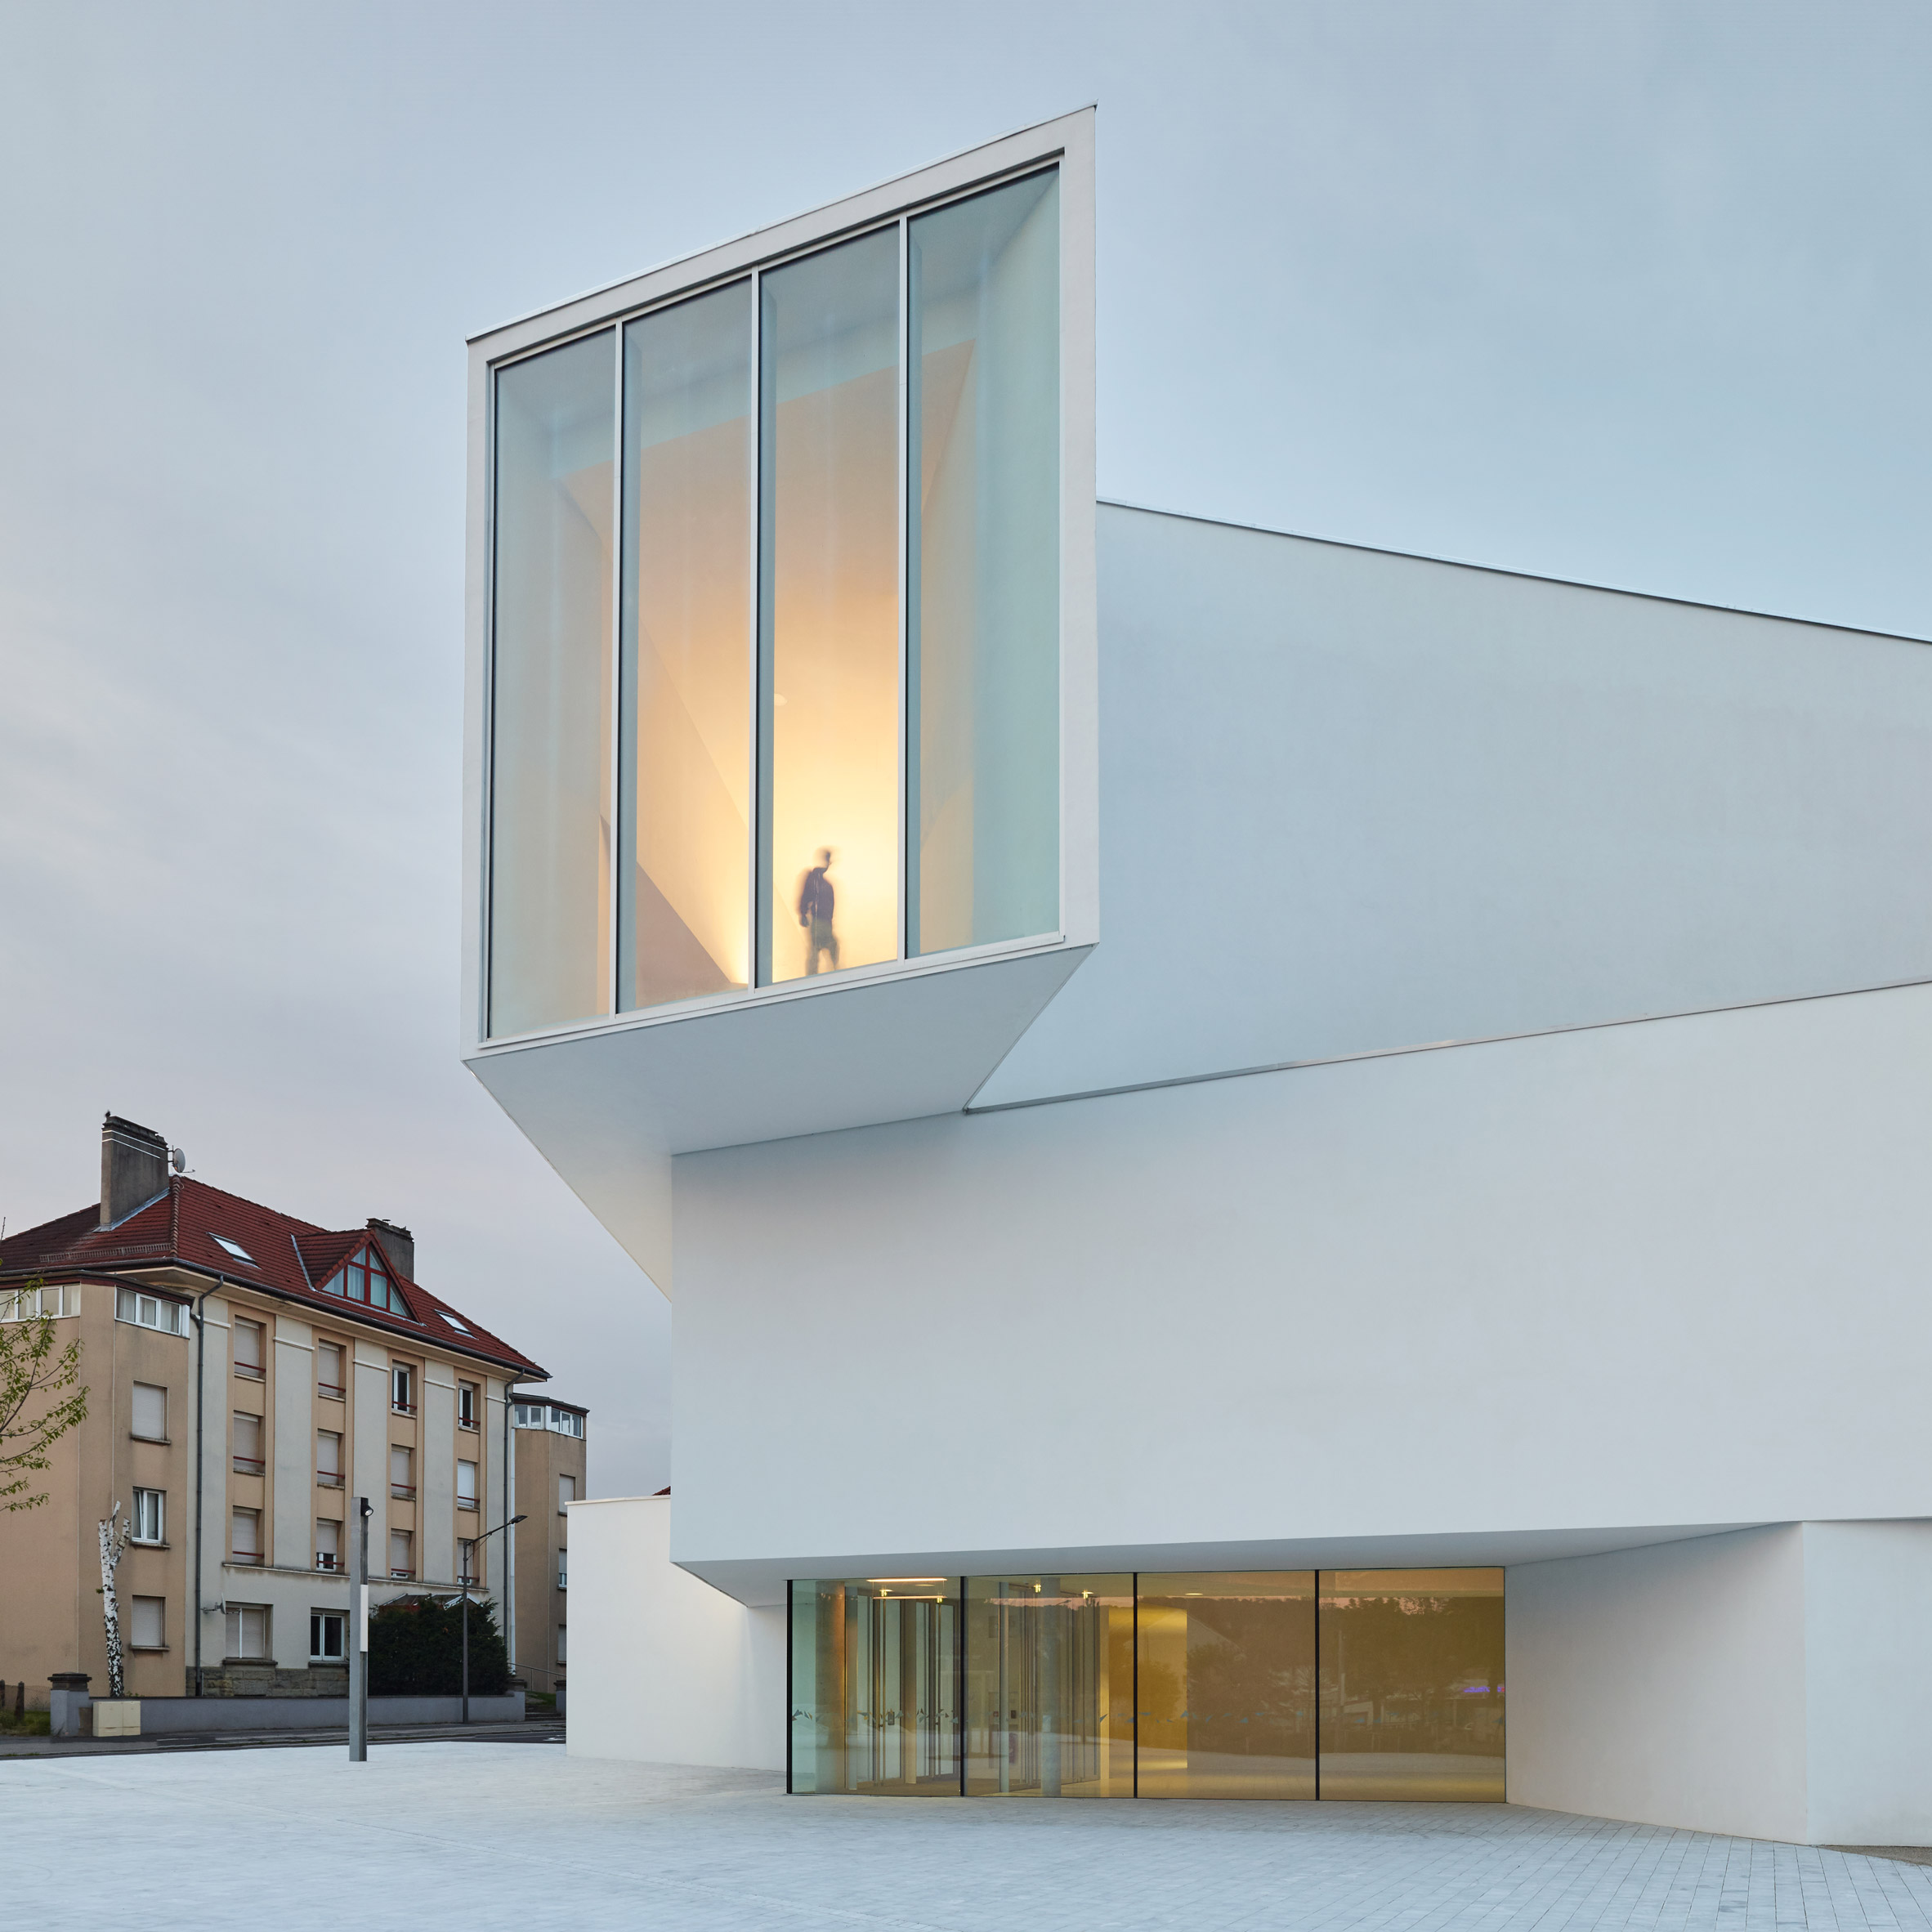 White Concrete Volumes Conceal Bright Red Auditorium In Dominique Coulon Associes Theatre